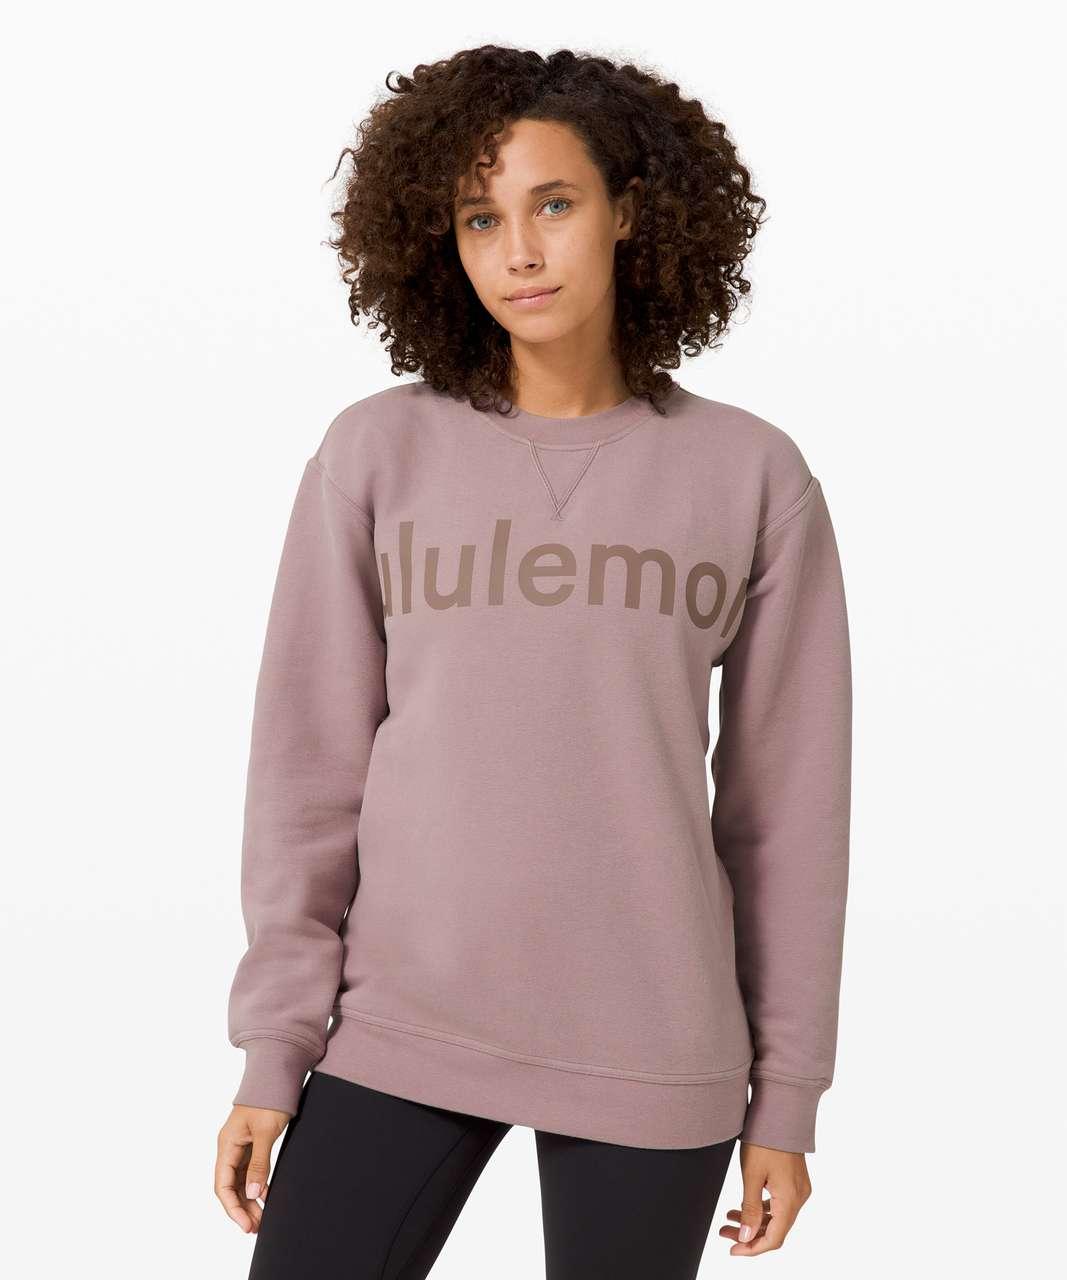 Lululemon All Yours Crew *Graphic - Violet Verbena